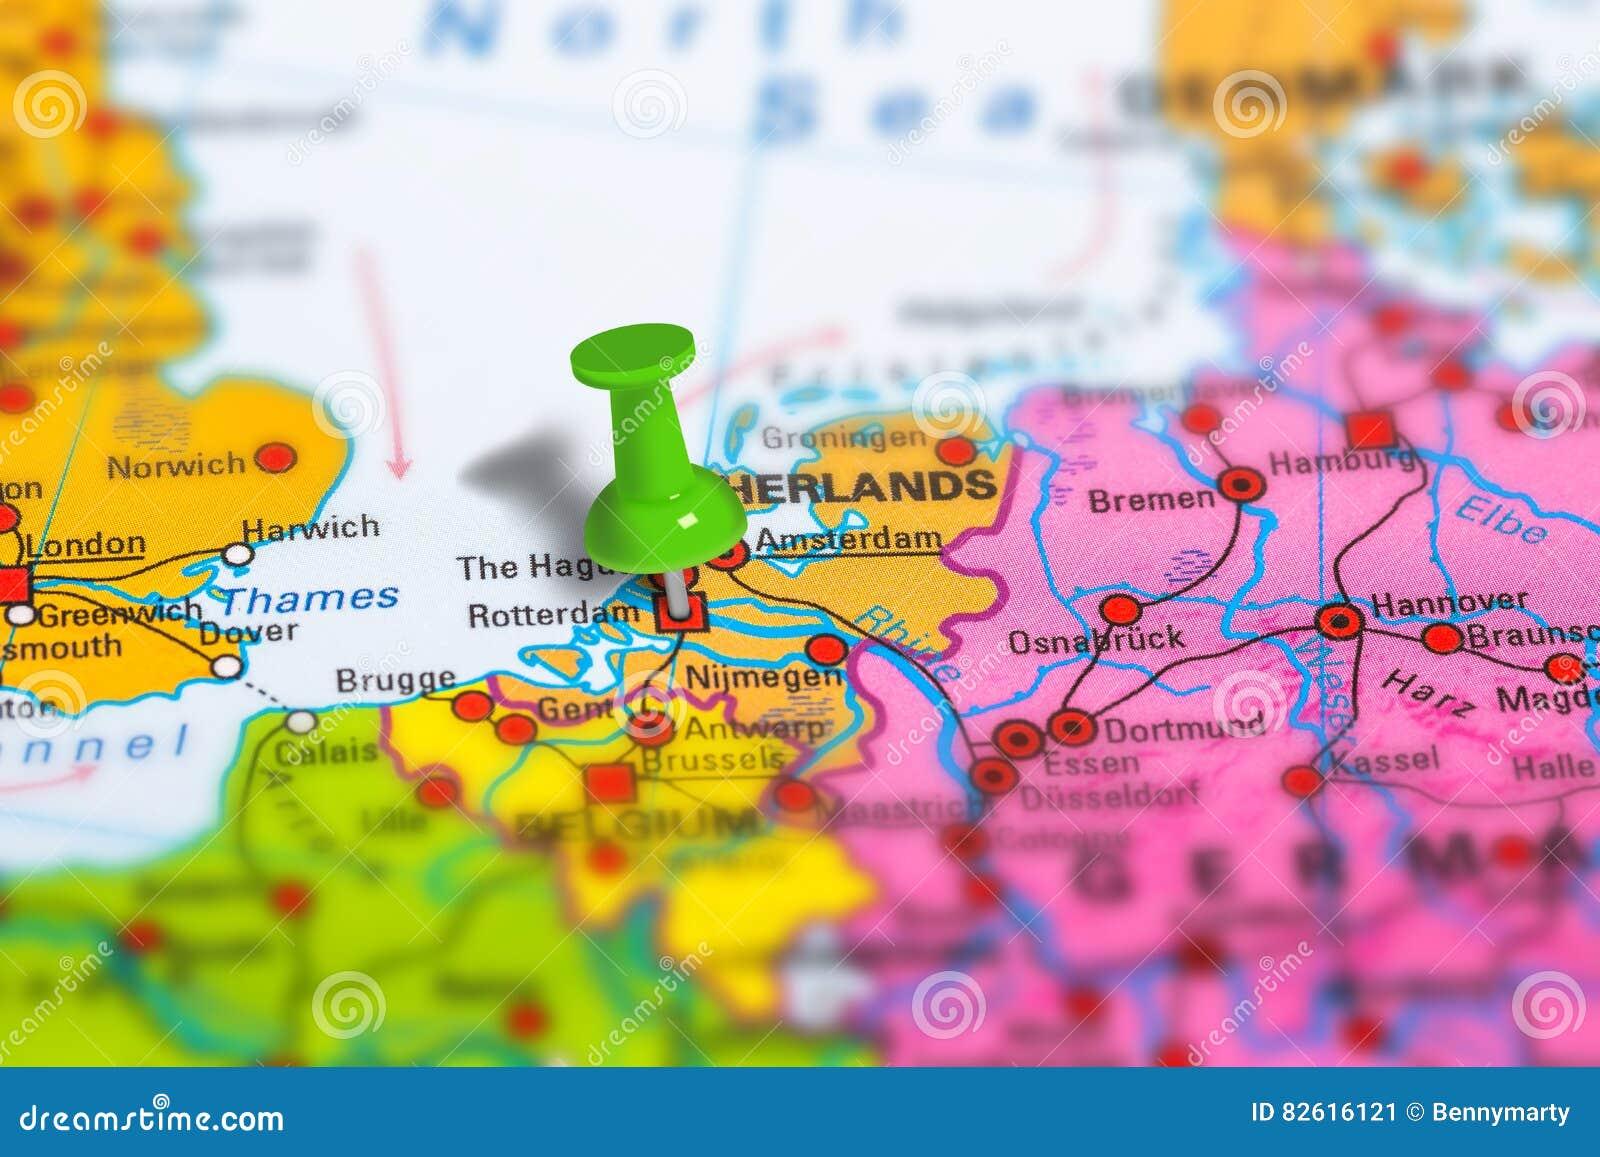 Rotterdam Netherlands Map Stock Image Image Of Macro 82616121